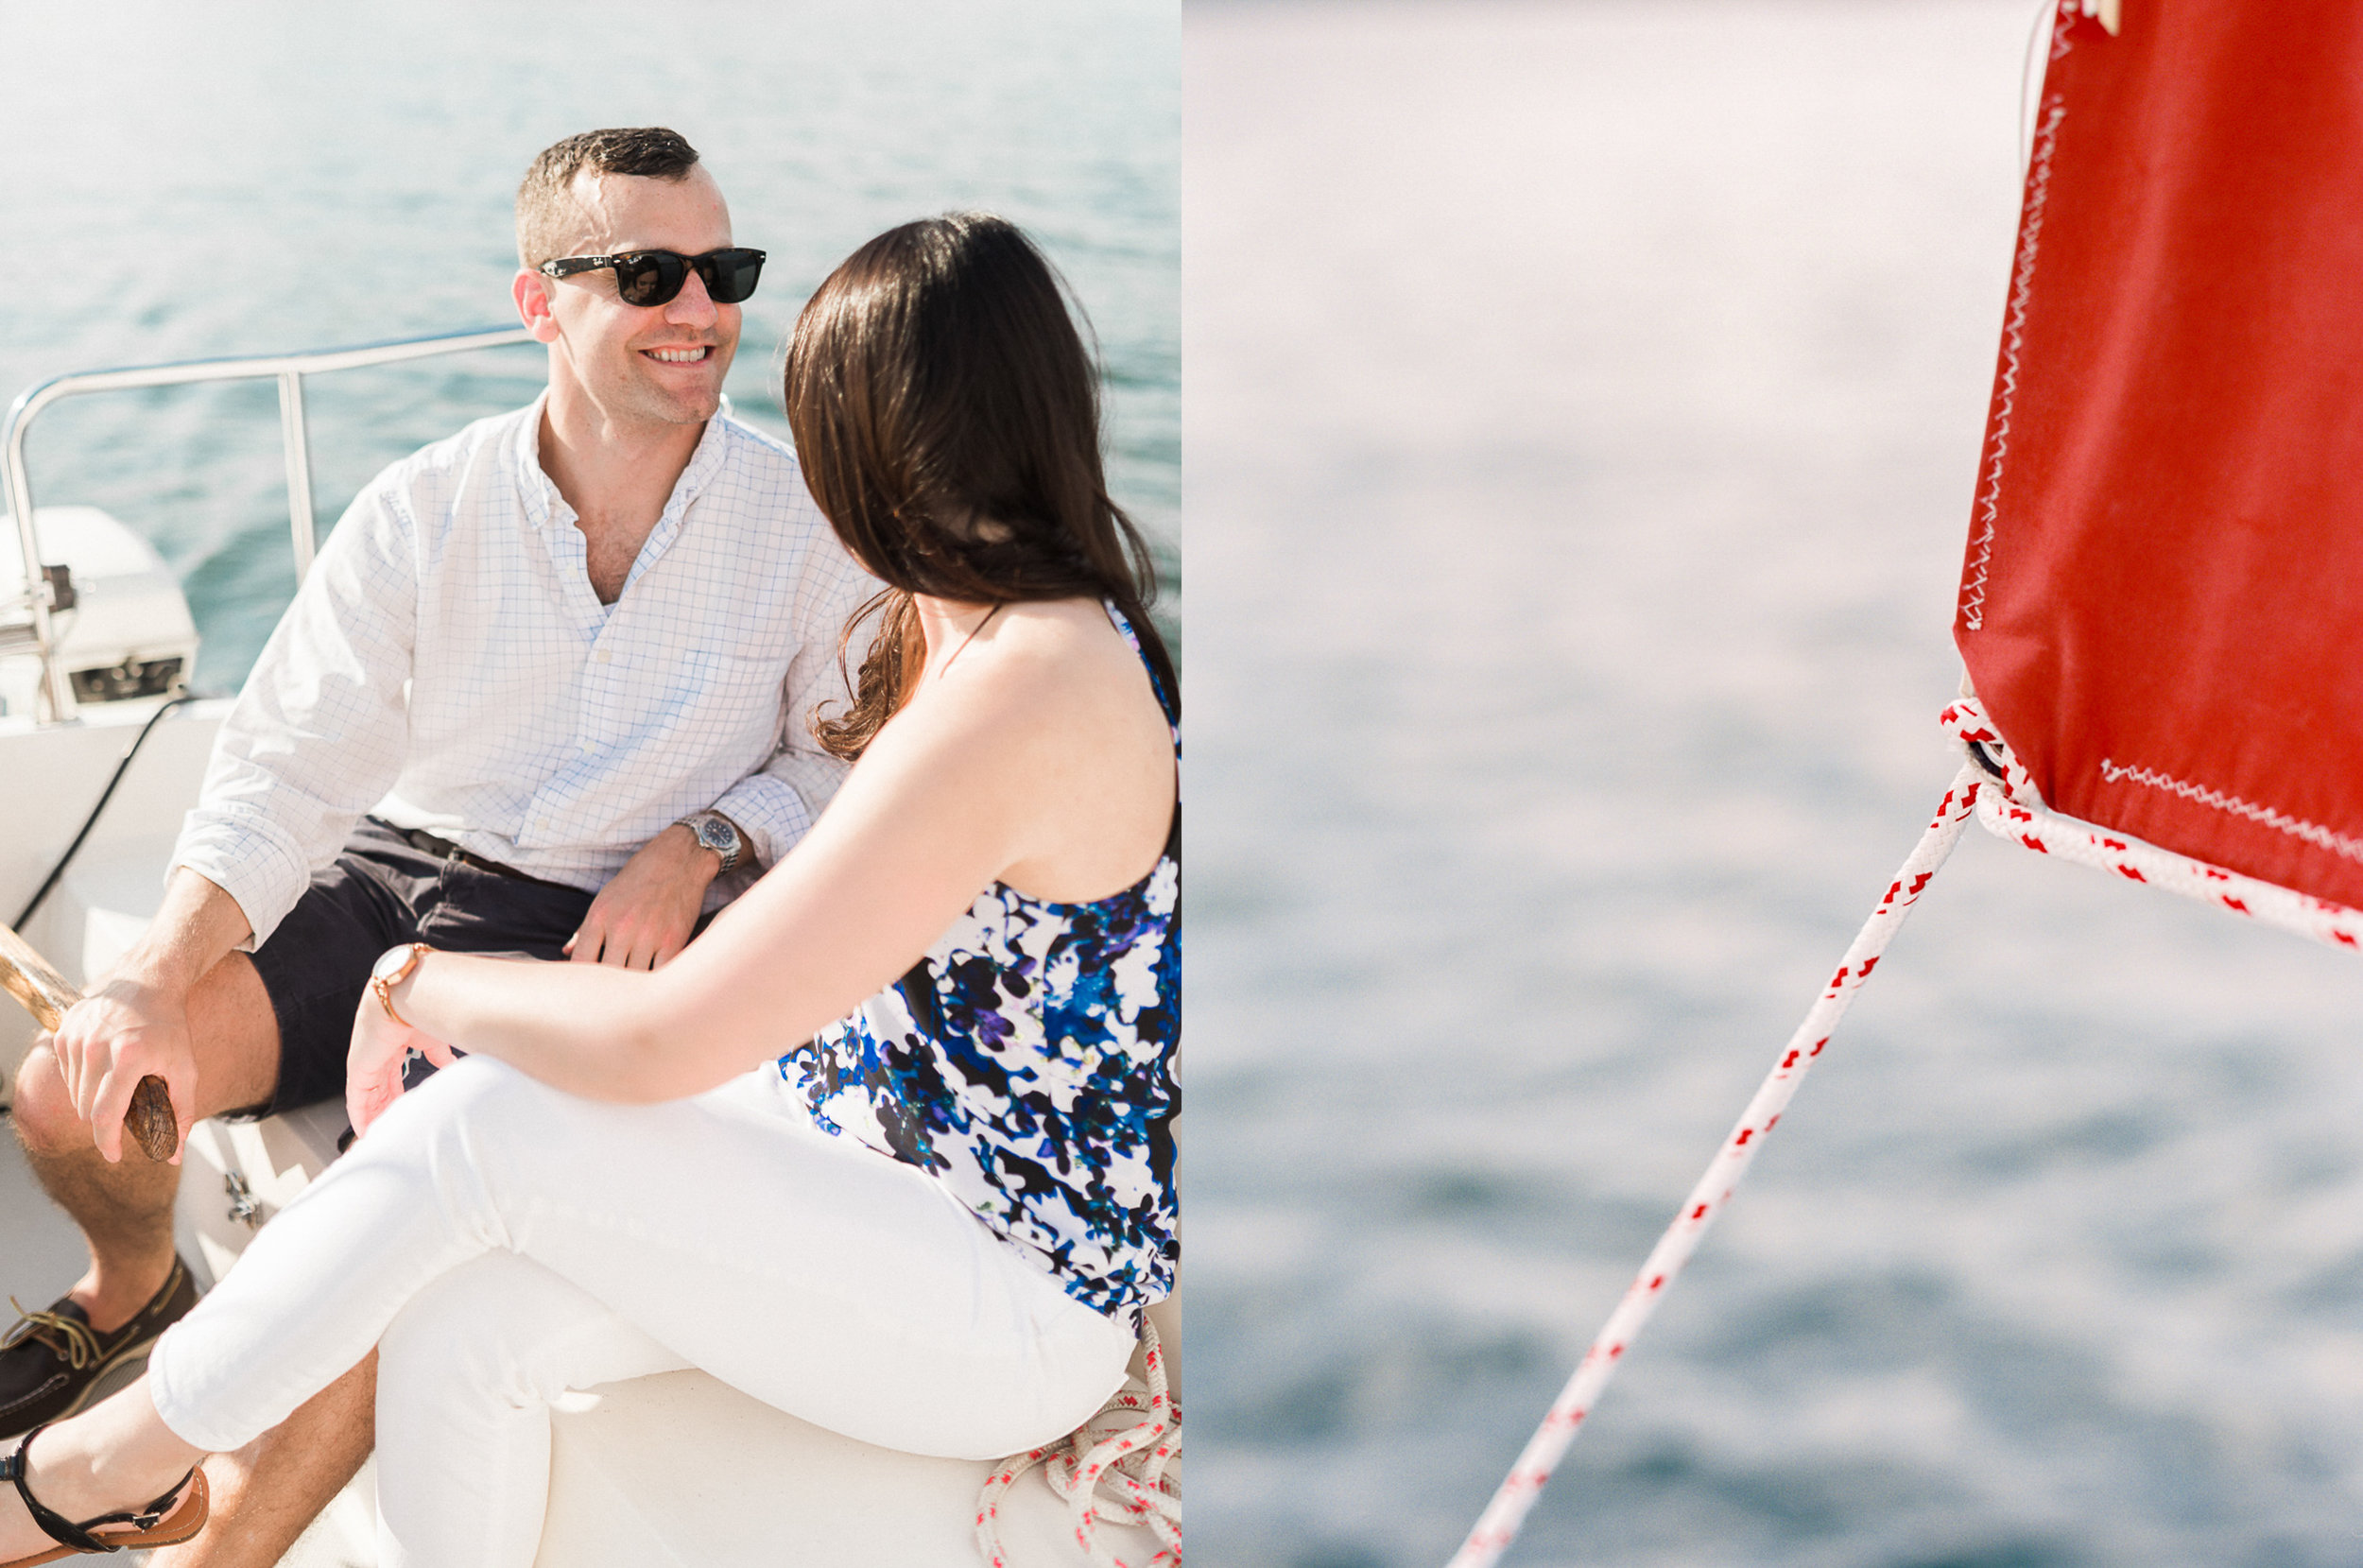 smith-mountain-lake-sailboat-engagement-session-charlotte-sailing-photographer-7.jpg